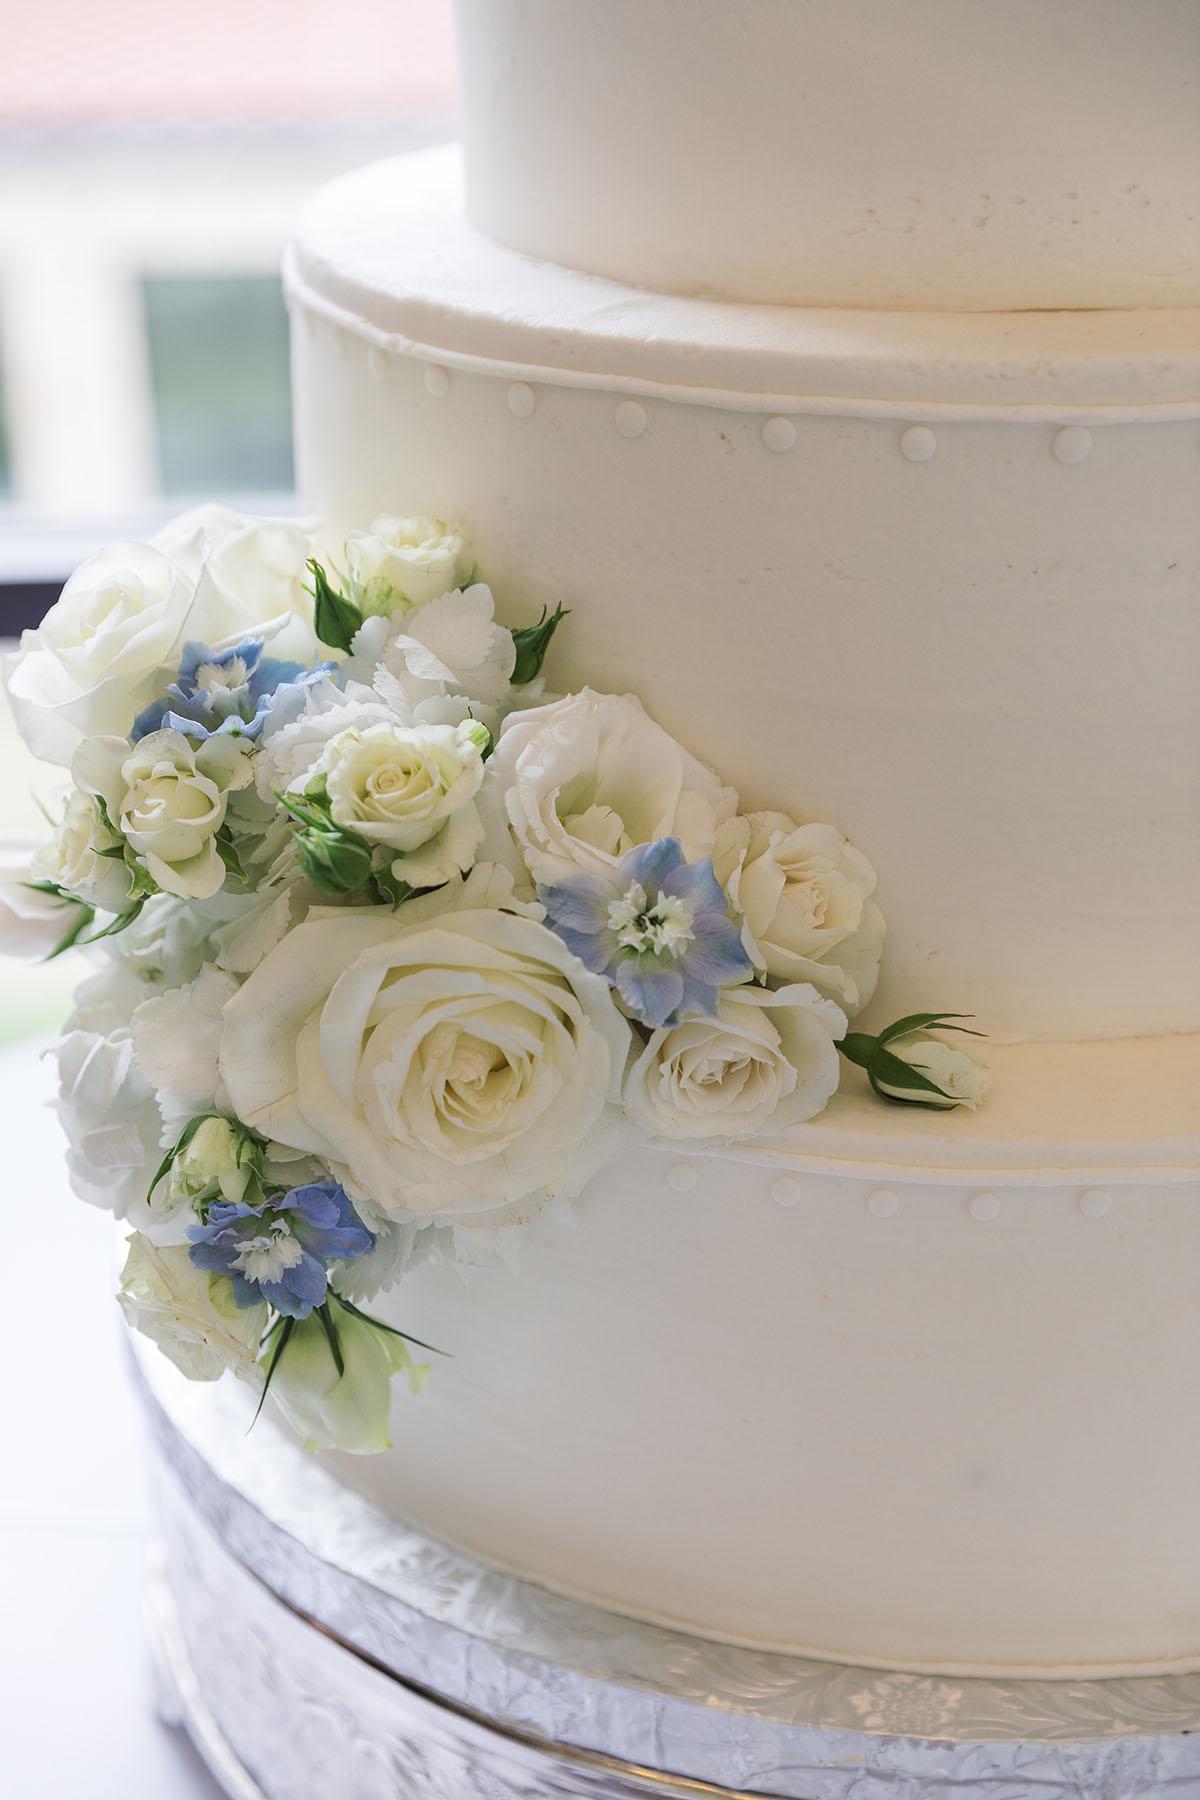 The bridal cake